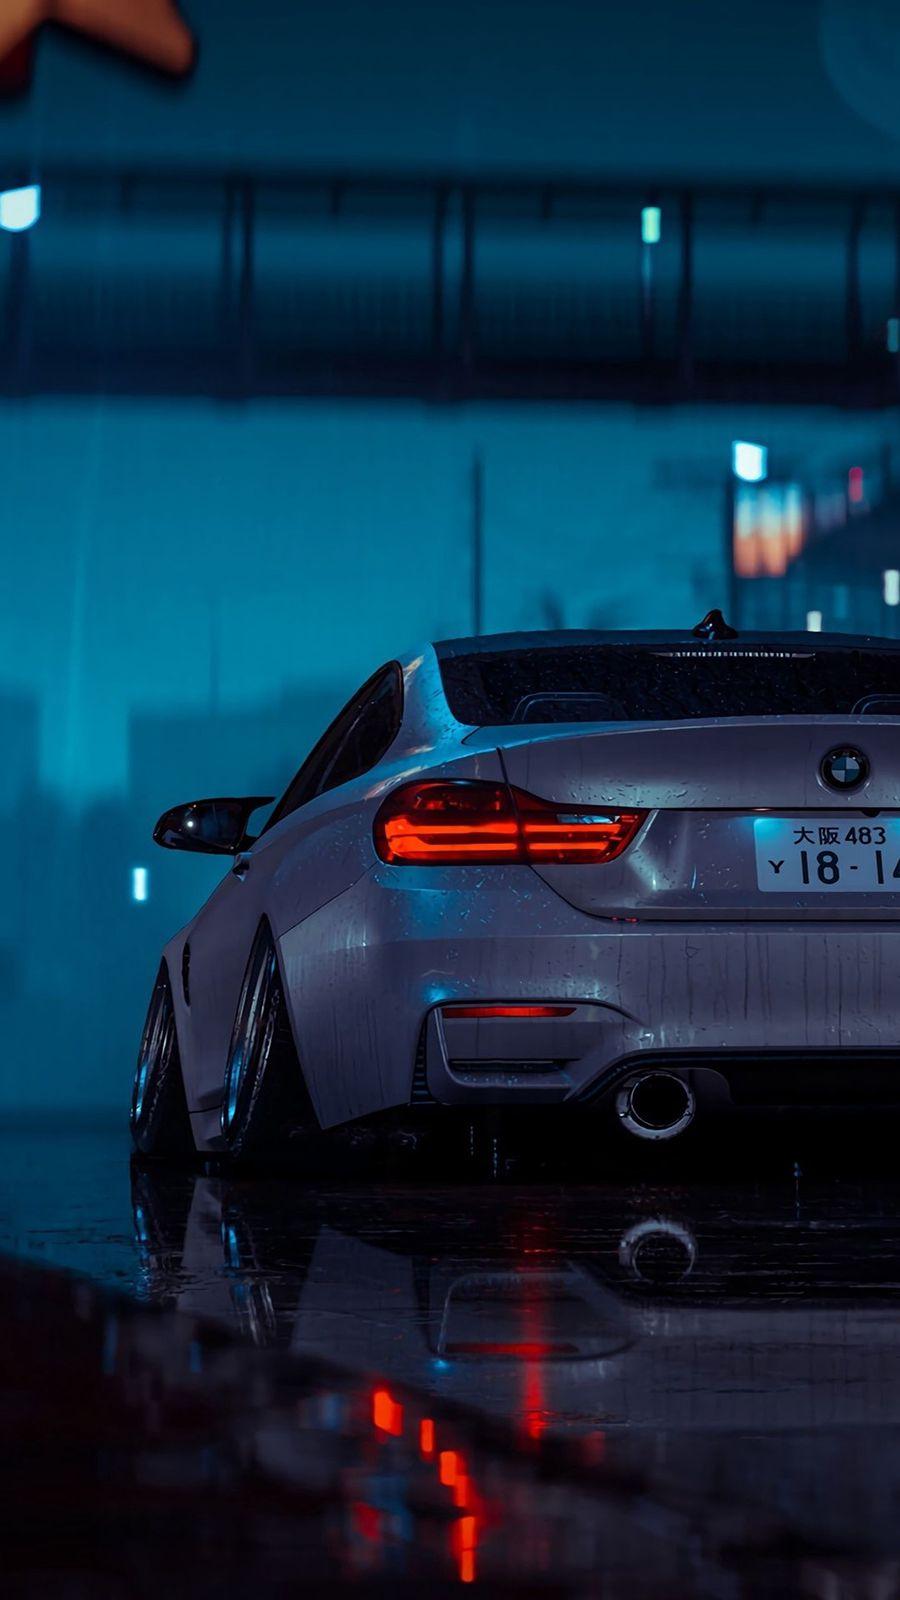 BMW Wallpapers - BMW Wallpapers #2 - Wattpad